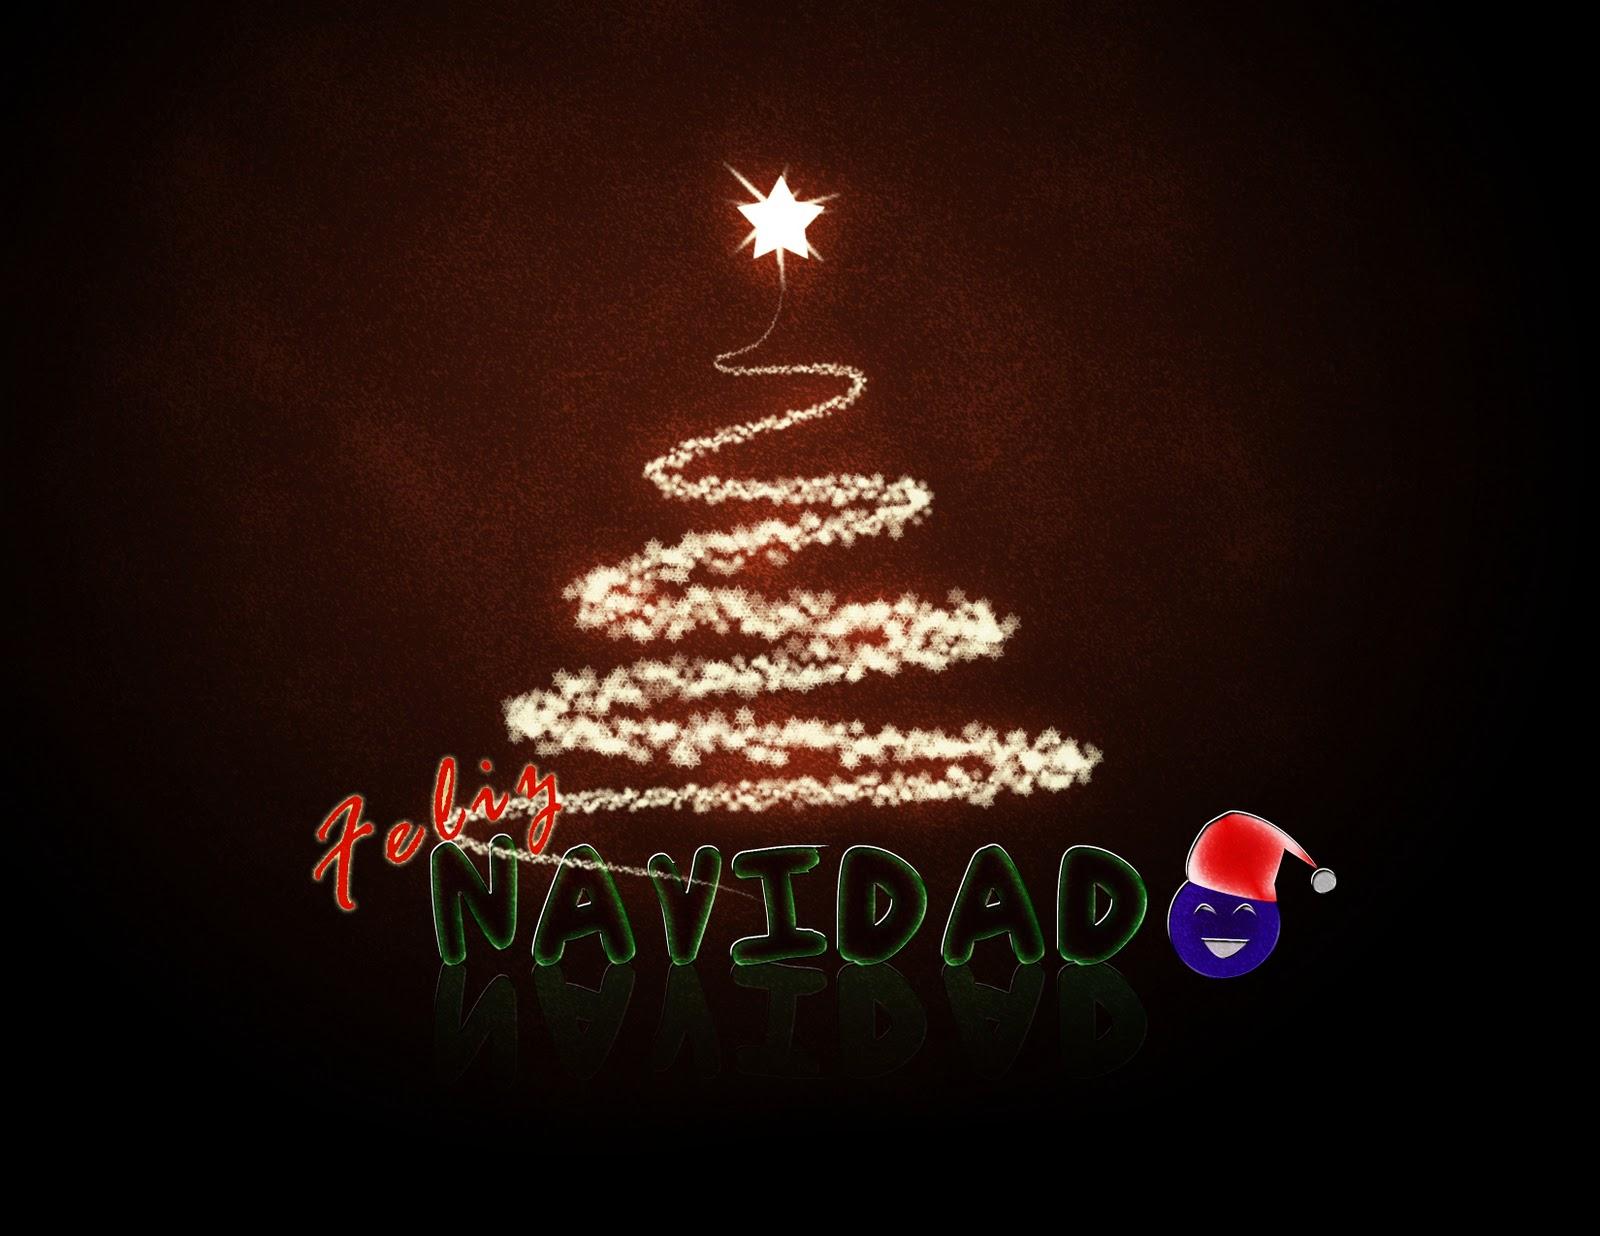 http://1.bp.blogspot.com/_jNf7H9UpjGc/TP7ZGyB3rmI/AAAAAAAAAD4/wbJuCUAKUjs/s1600/Wallpaper___Navidad_by_ArkadyNekozukii.jpg